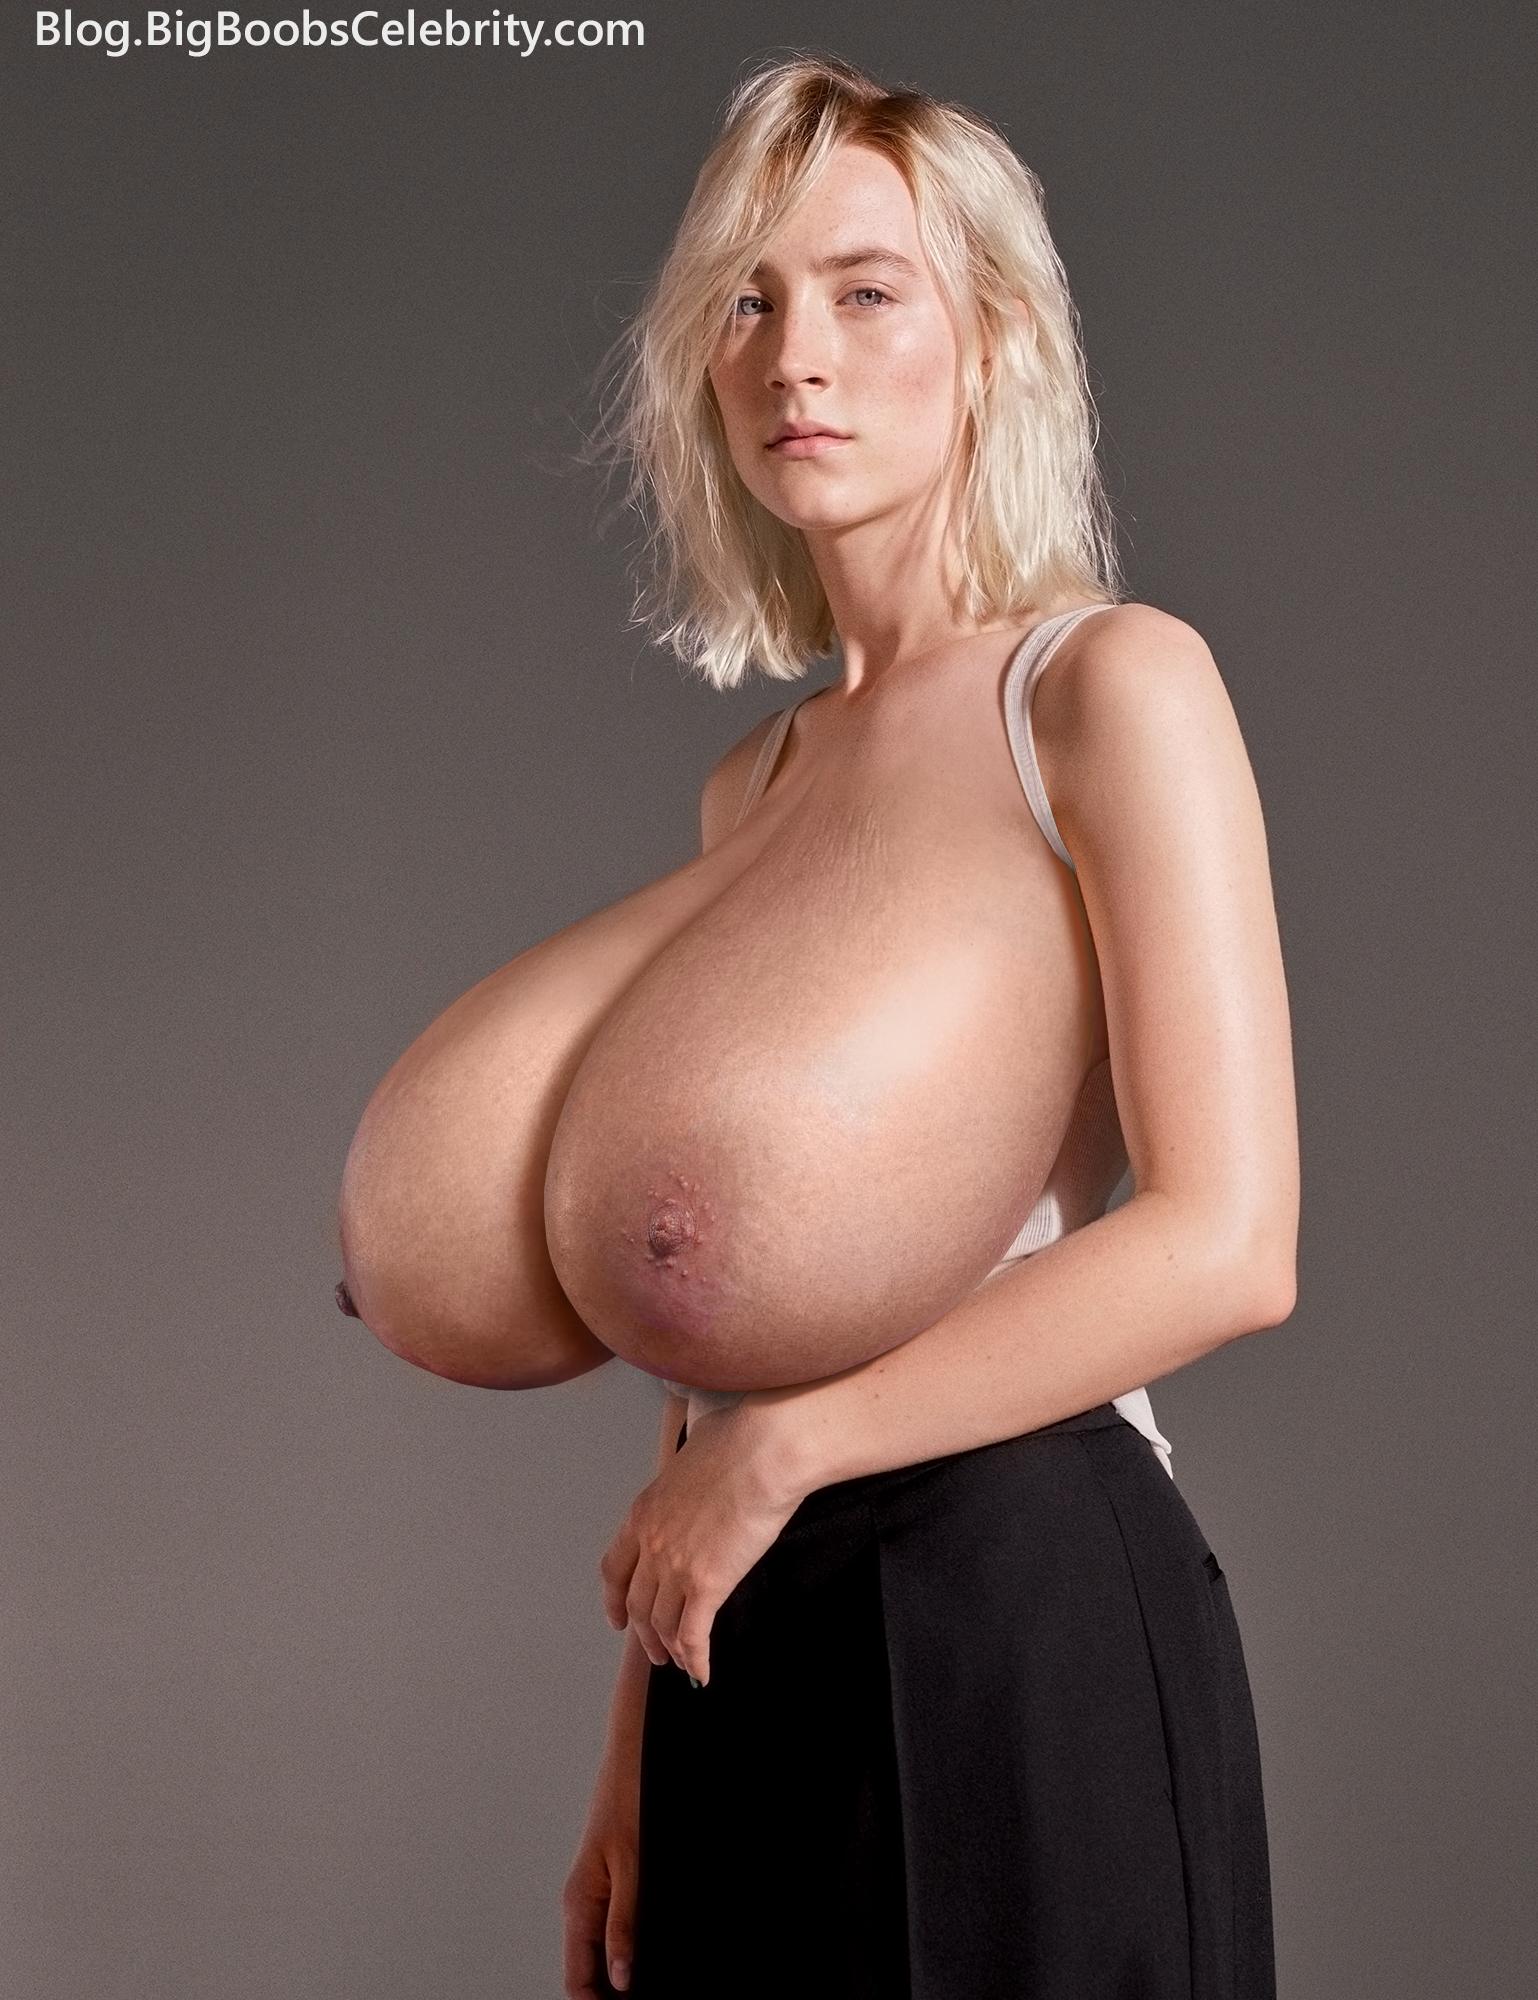 Enormous giant tits